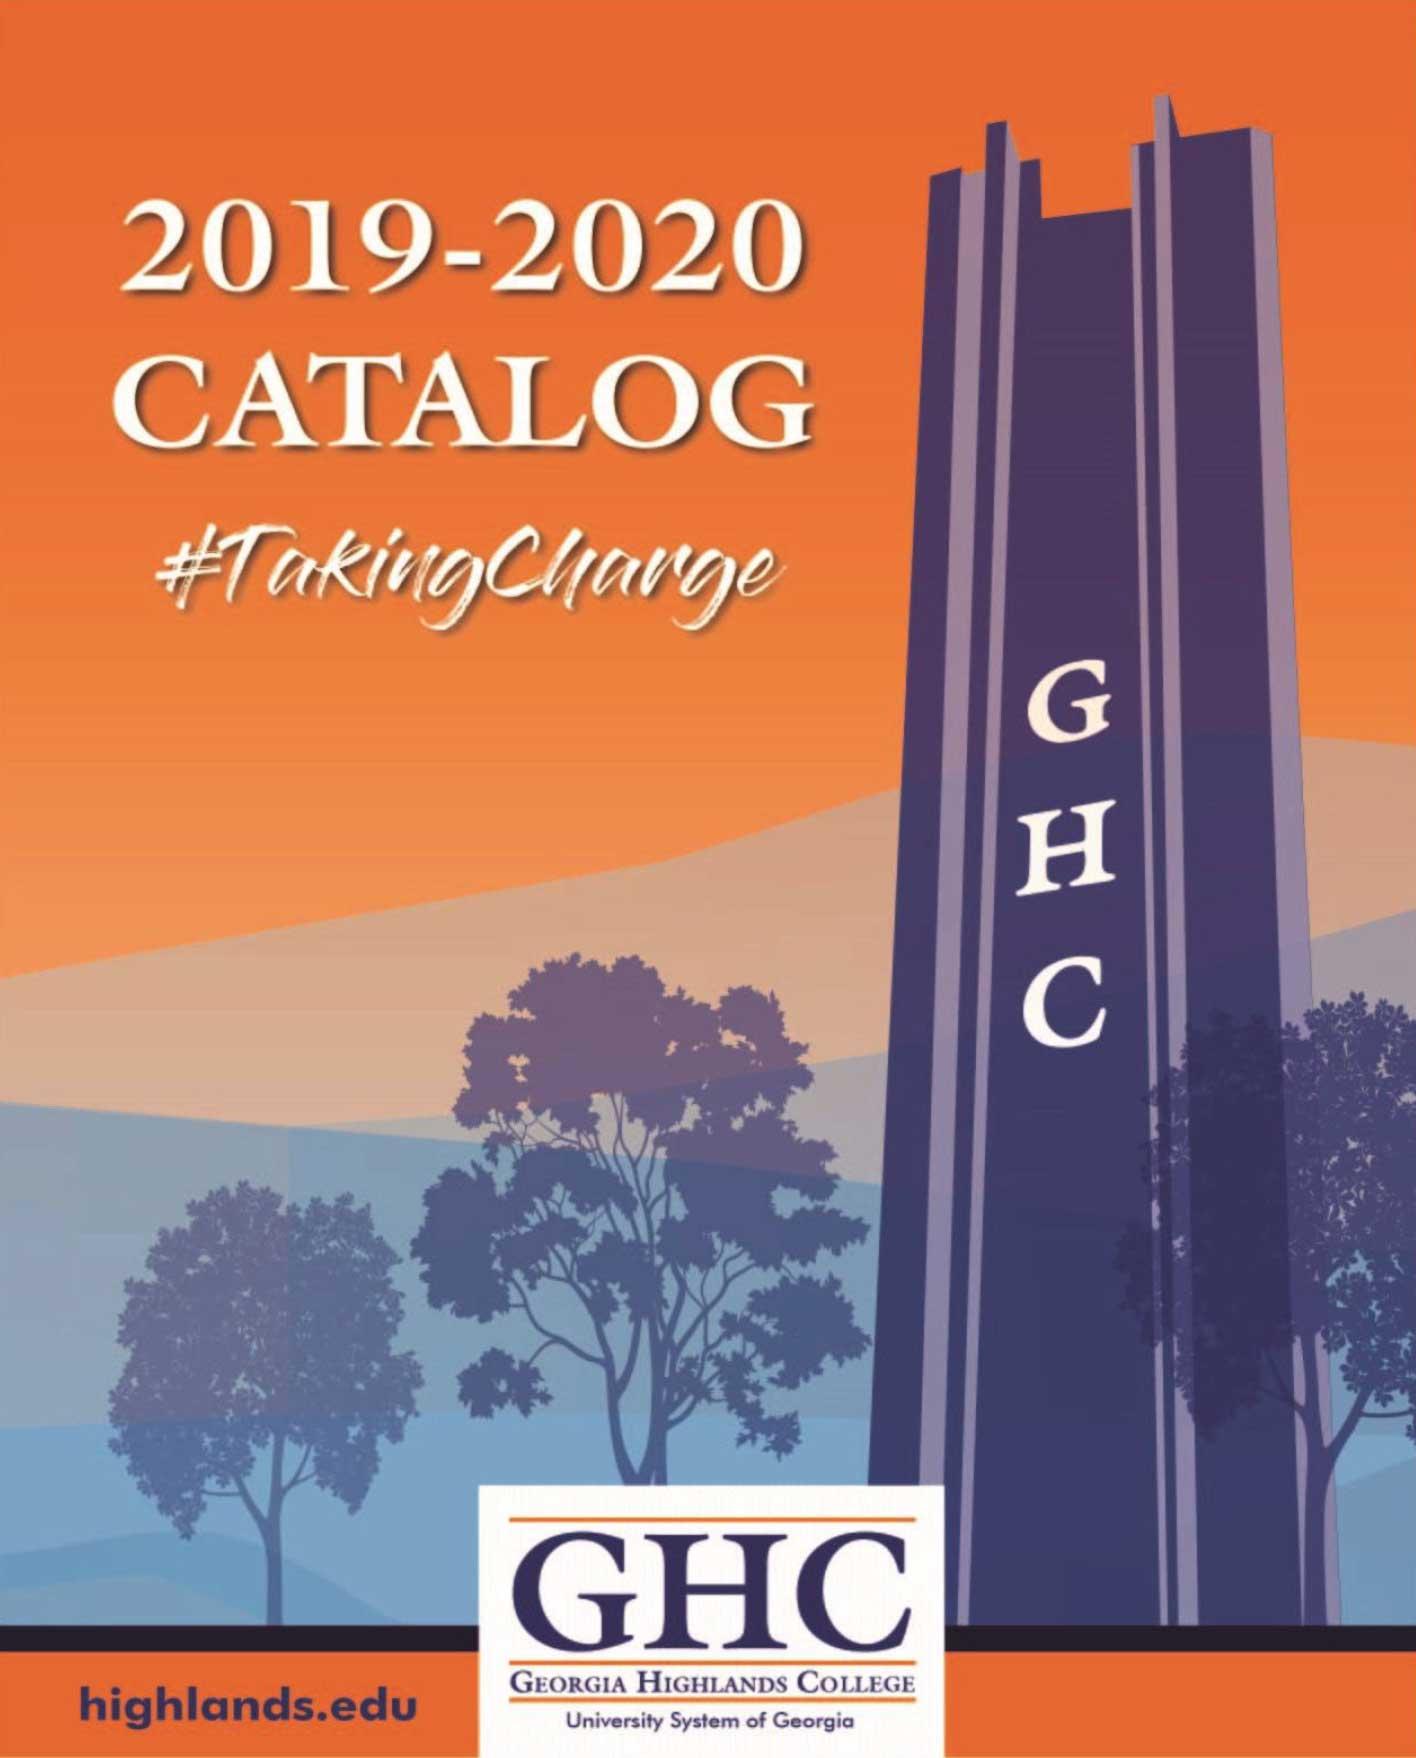 2019-2020 GHC Catalog